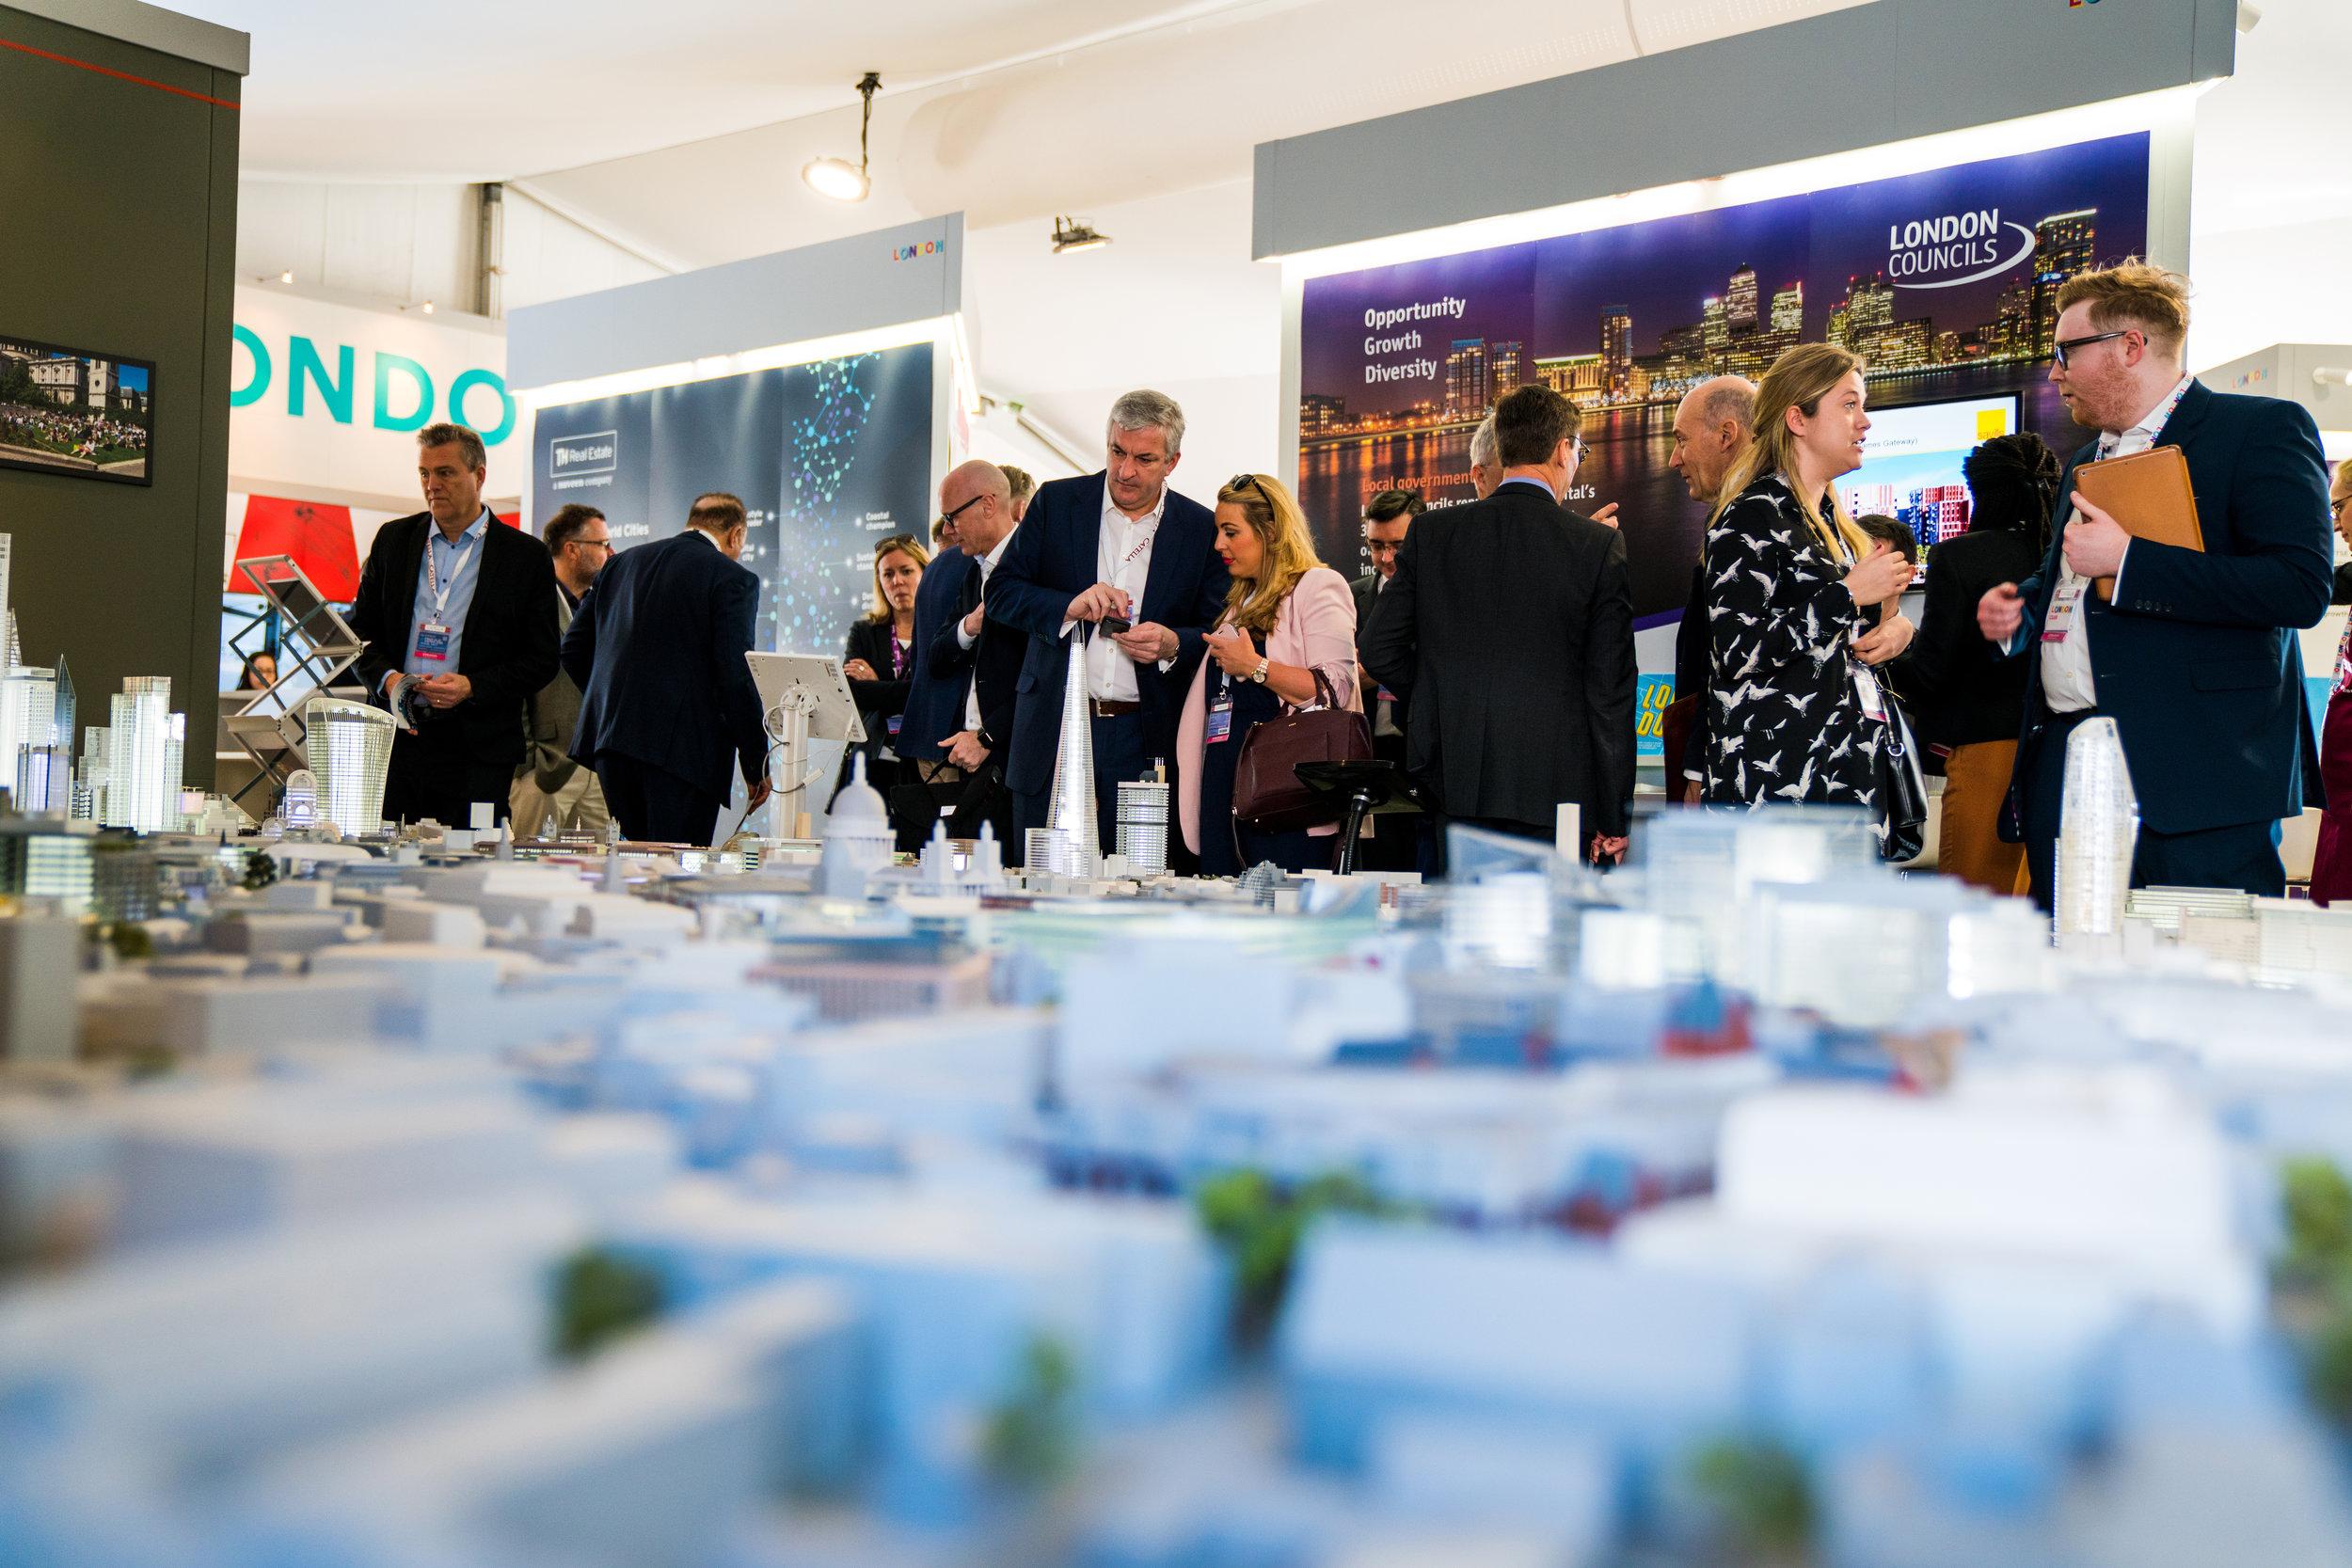 LONatMIPIM18_city model delegates.jpg